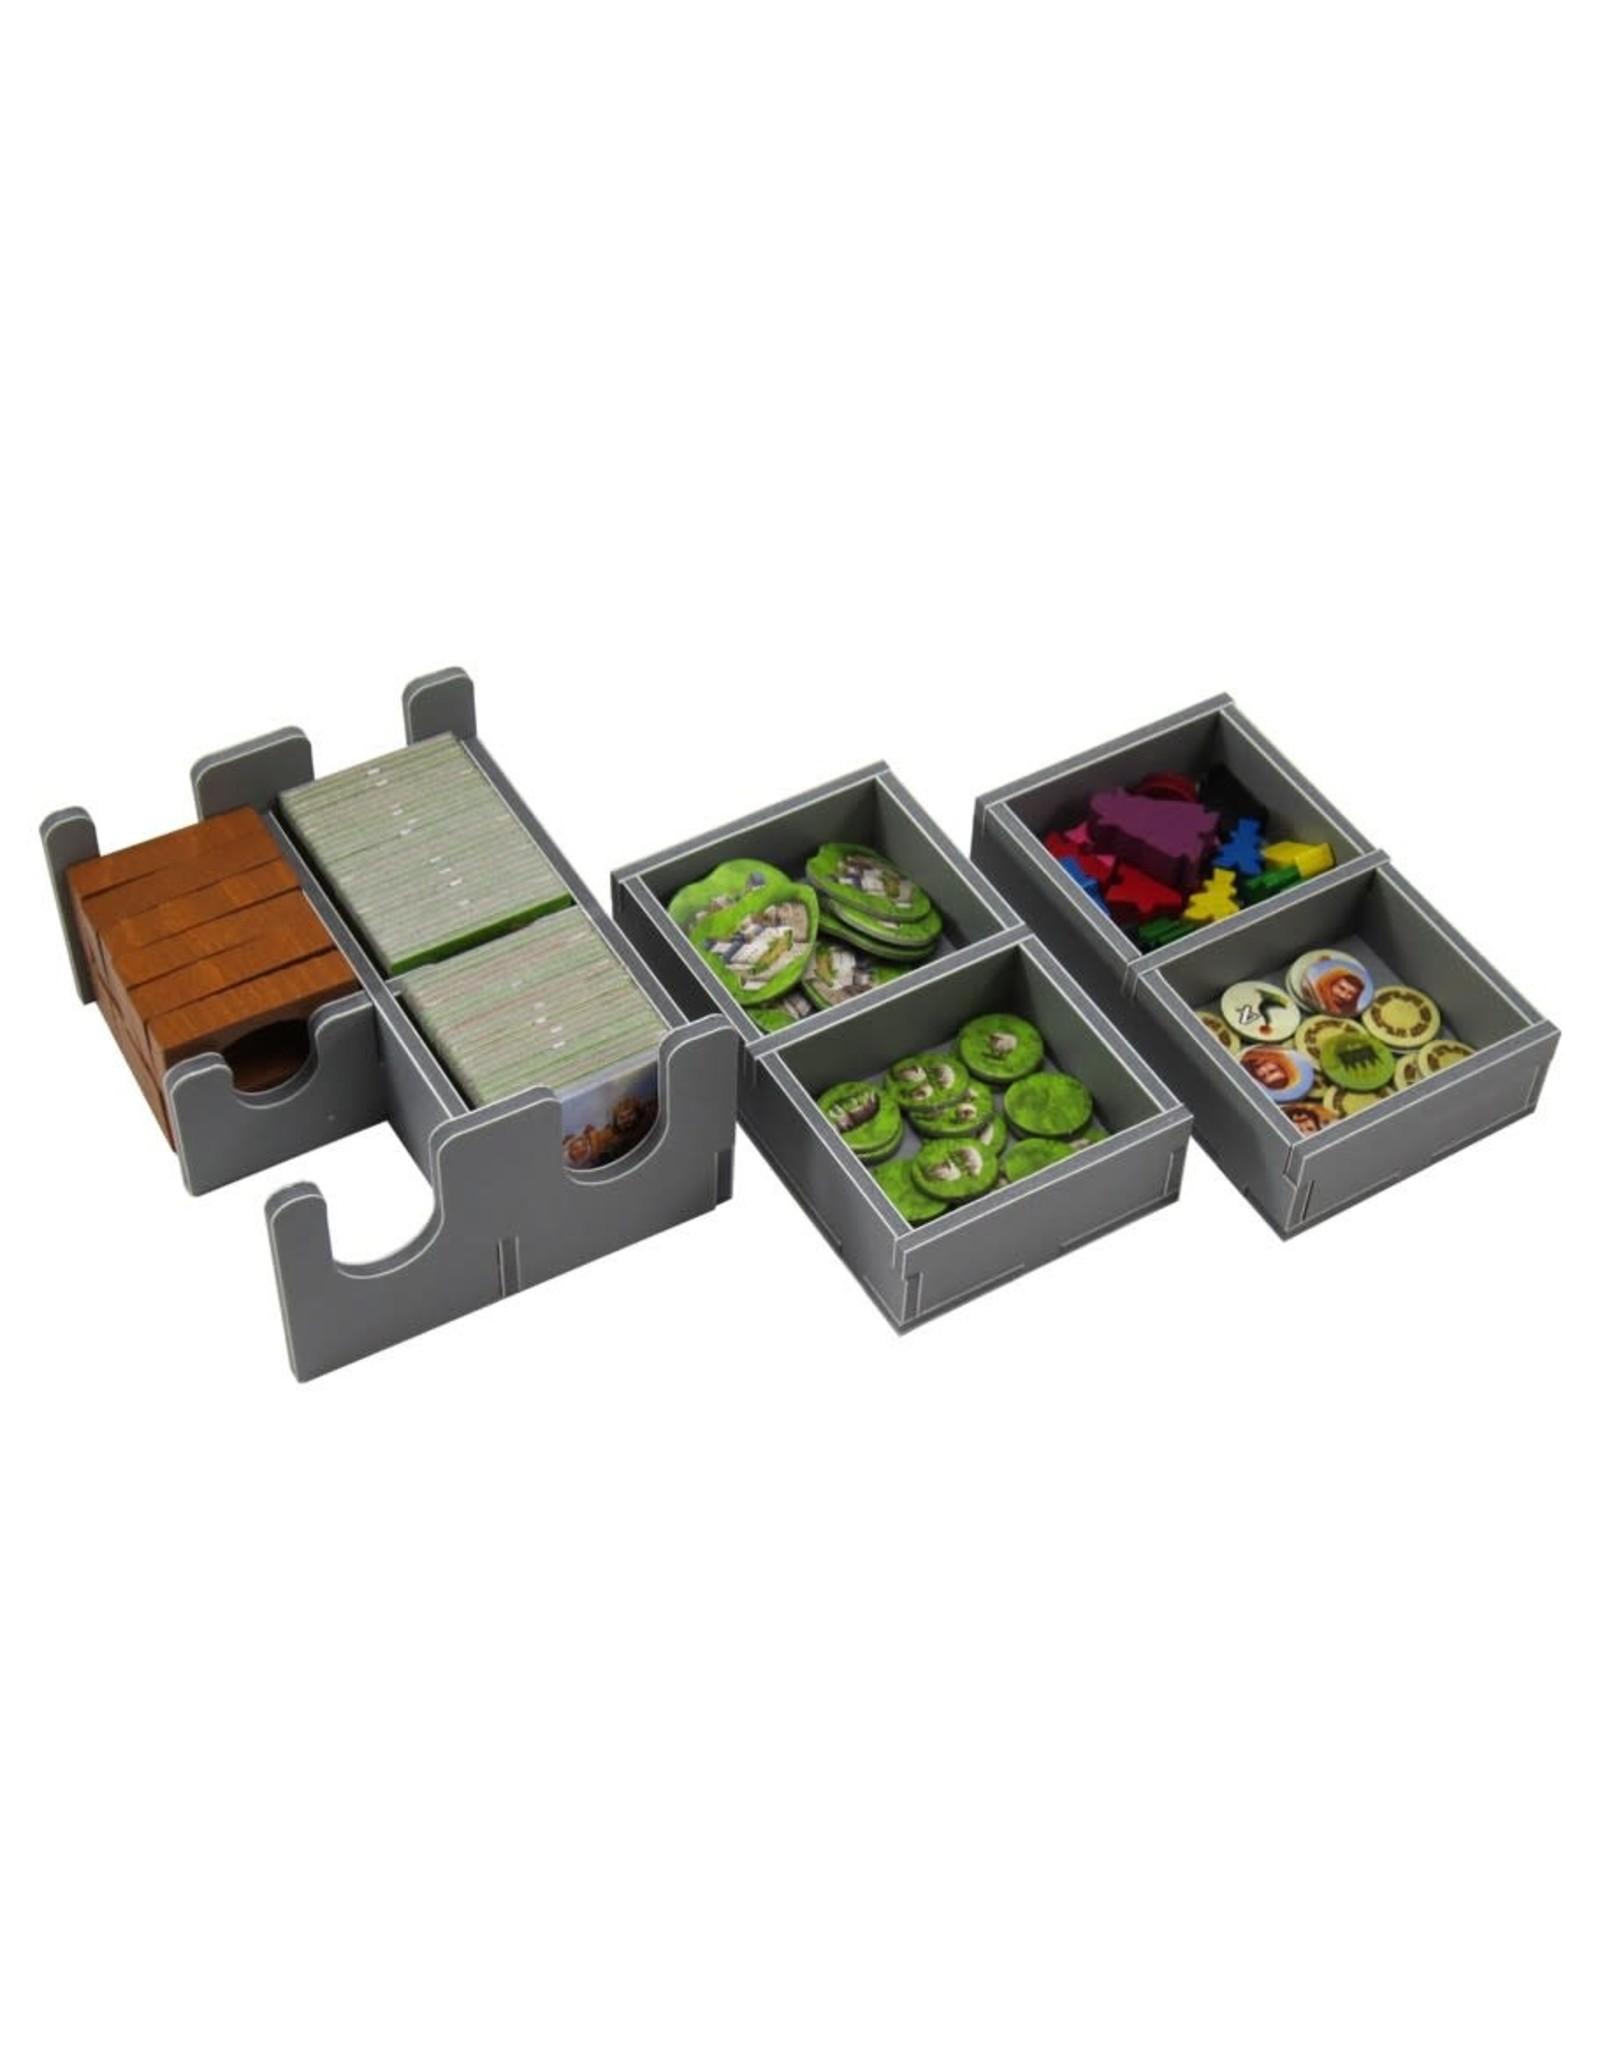 Folded Space Box Insert: Carcassonne & Exps